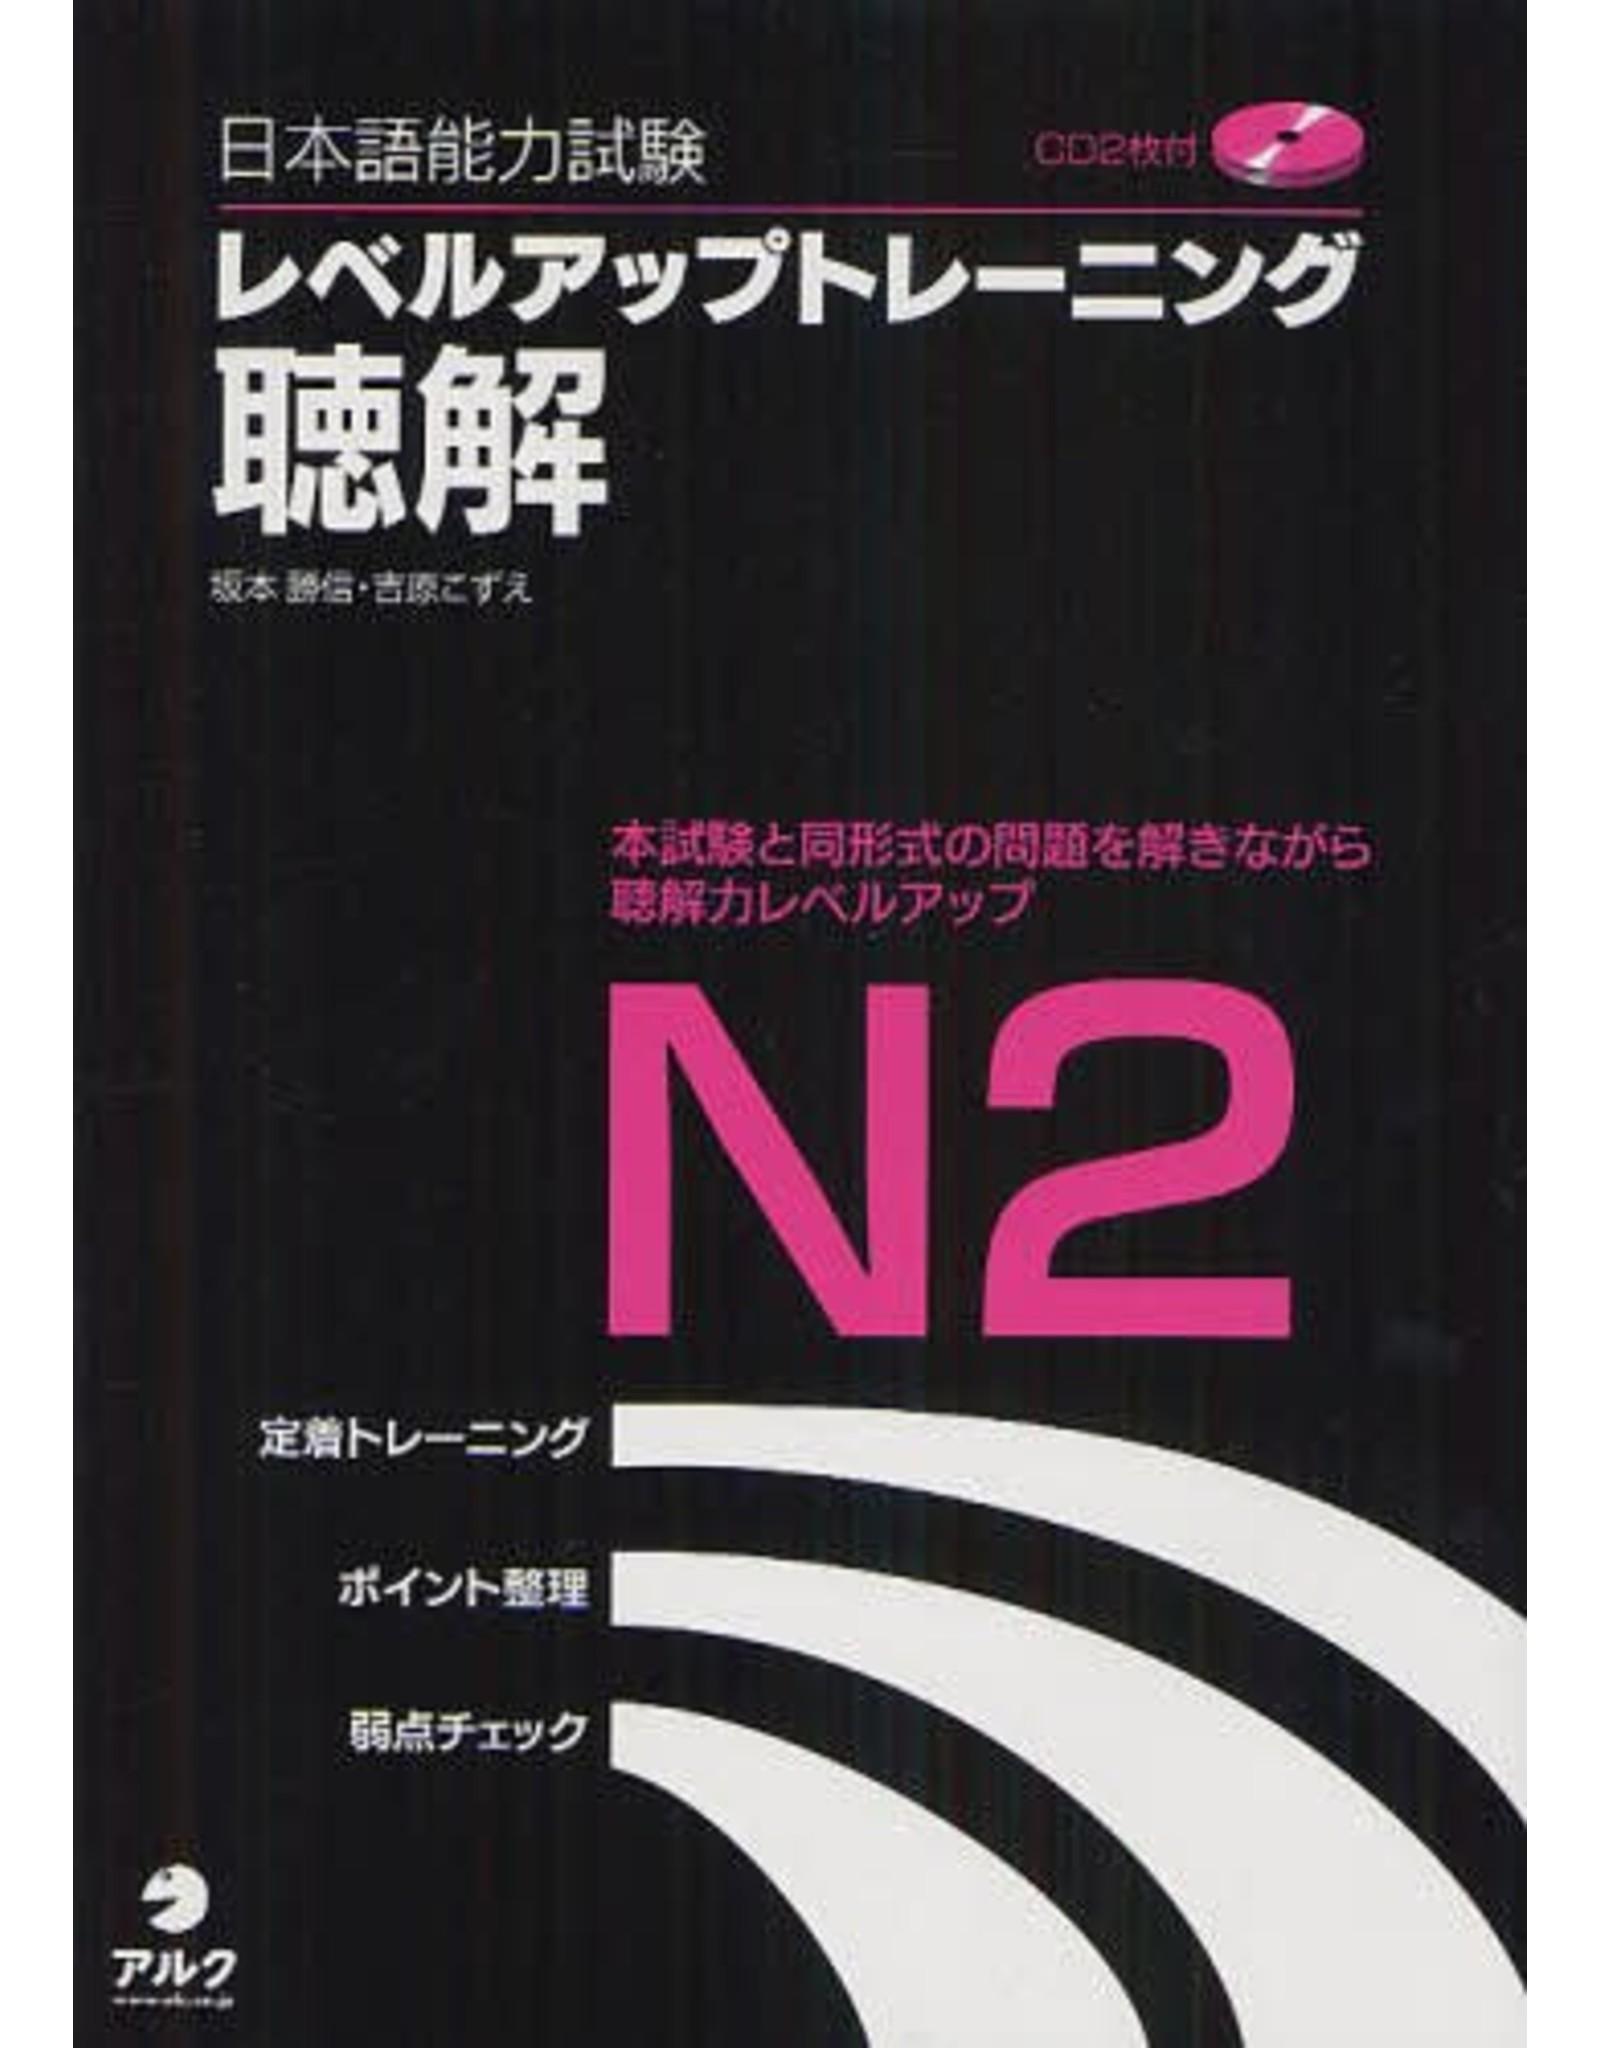 ALC JLPT LEVEL UP TRAINING CHOKAI N2 W/CDS